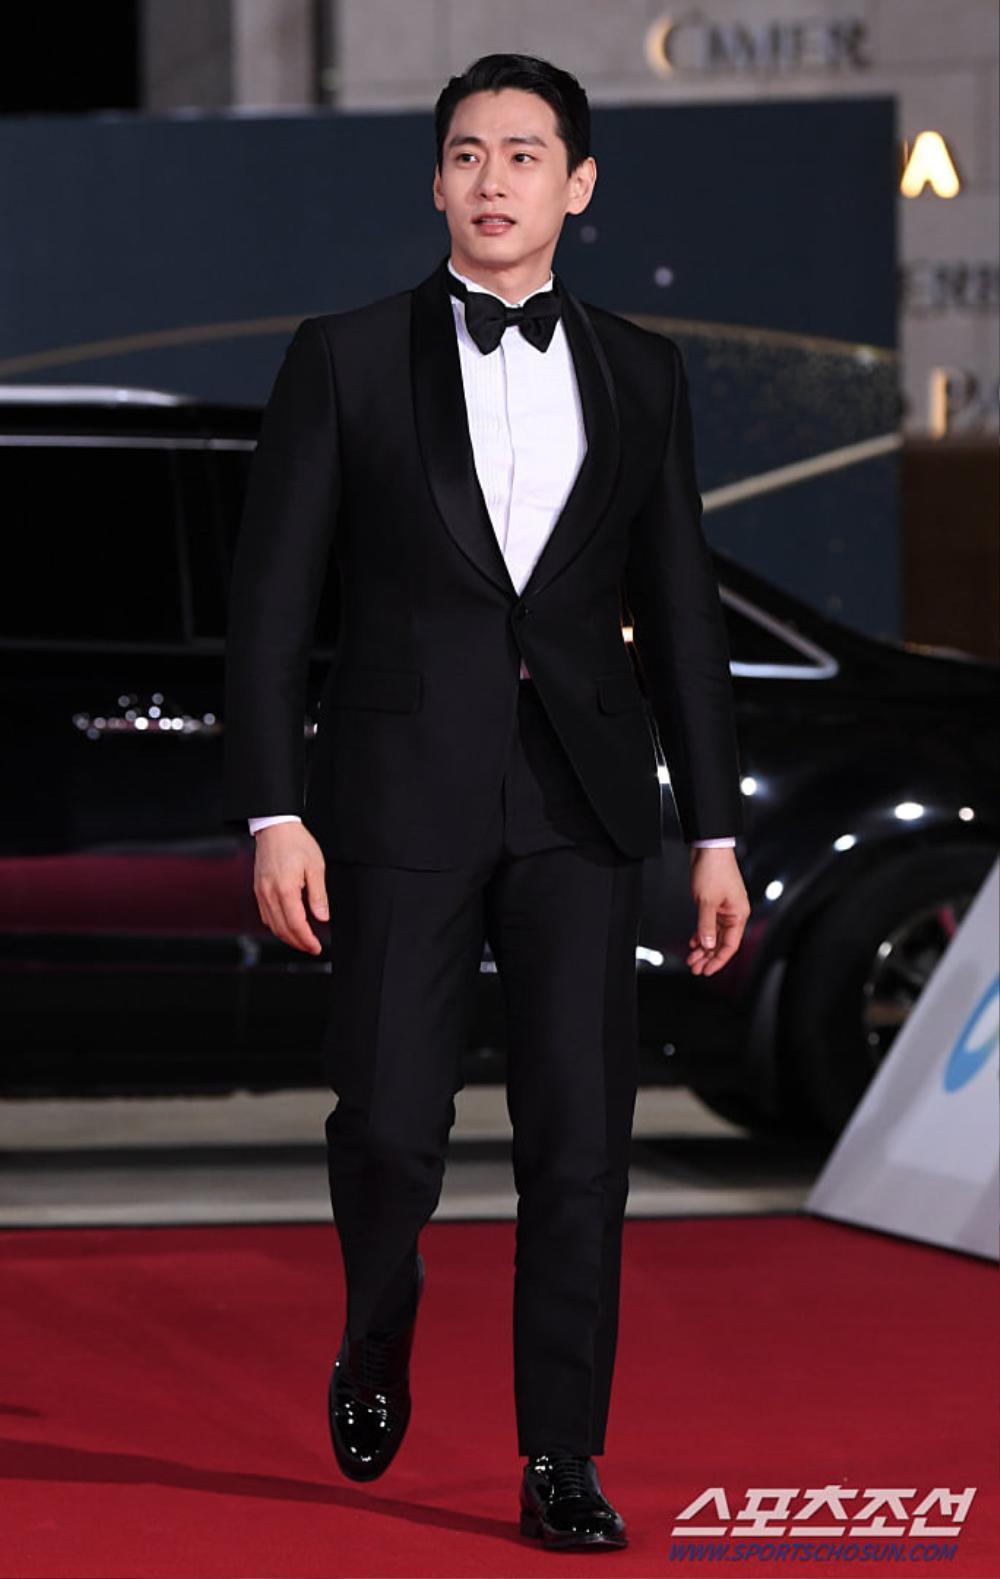 Thảm đỏ 'Rồng xanh 2020': Shin Hye Sun 'cân sắc' Shin Min Ah, Jung Woo Sung - Lee Byung Hun điển trai! Ảnh 36